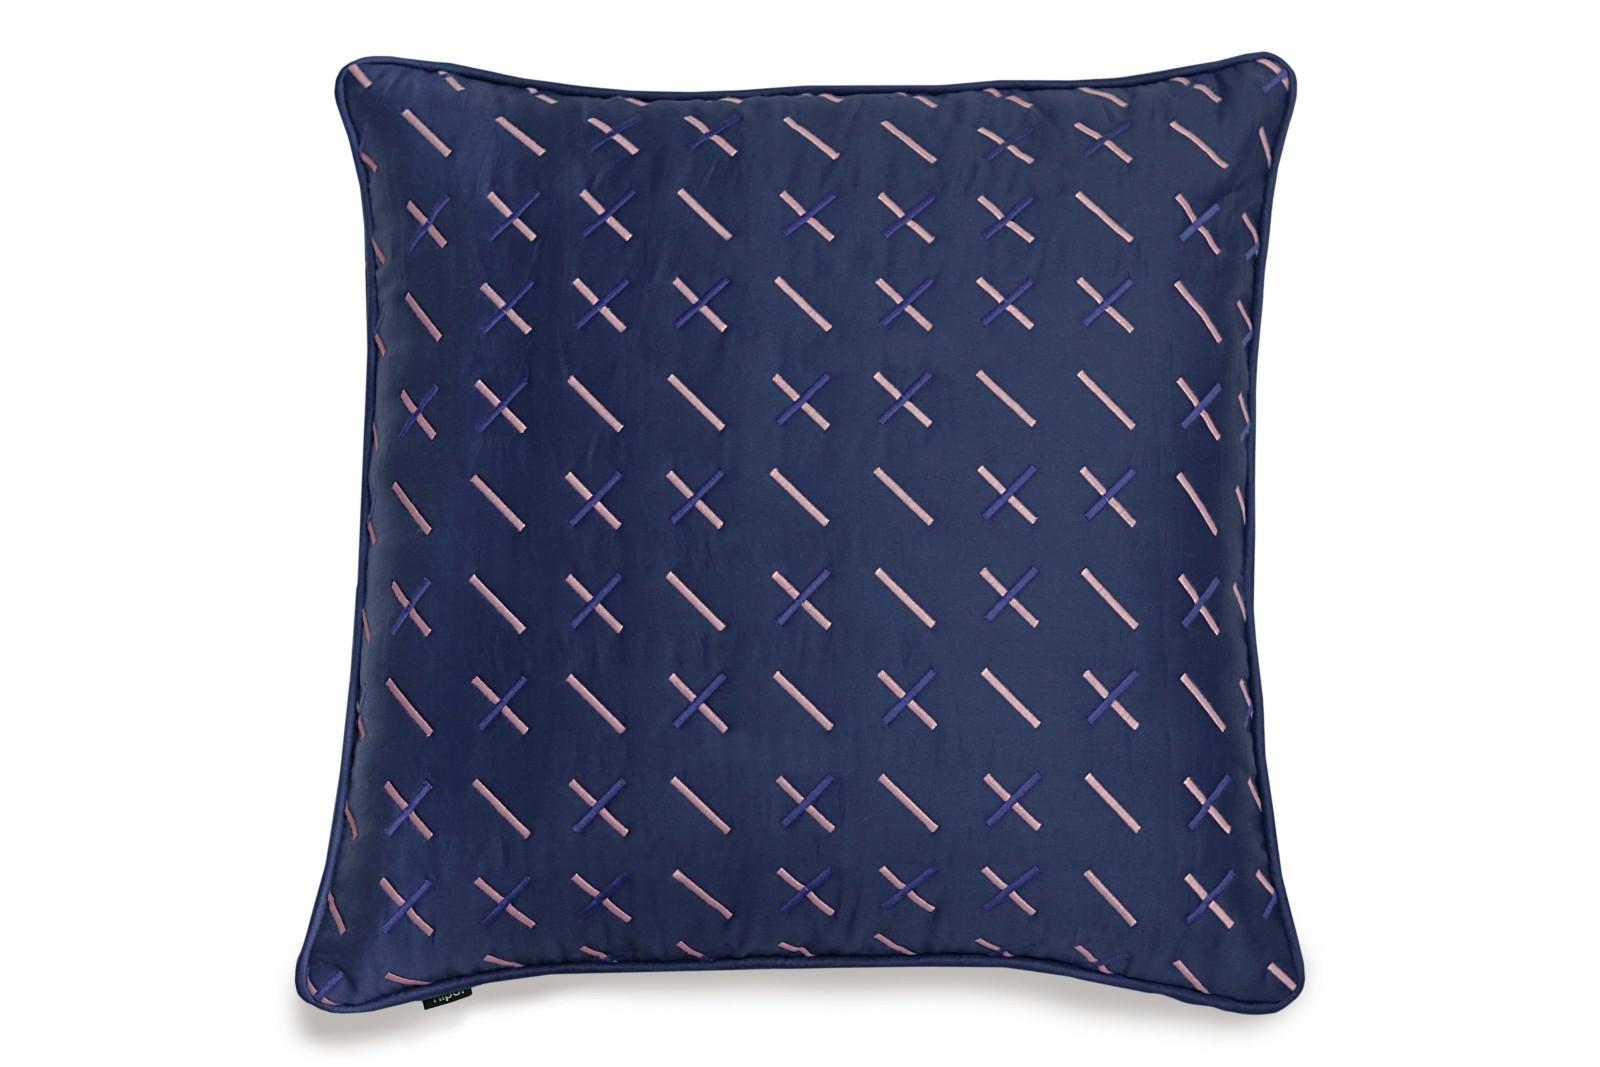 Modern Kantha Cushion Blue Square Cushion 50 x 50cm